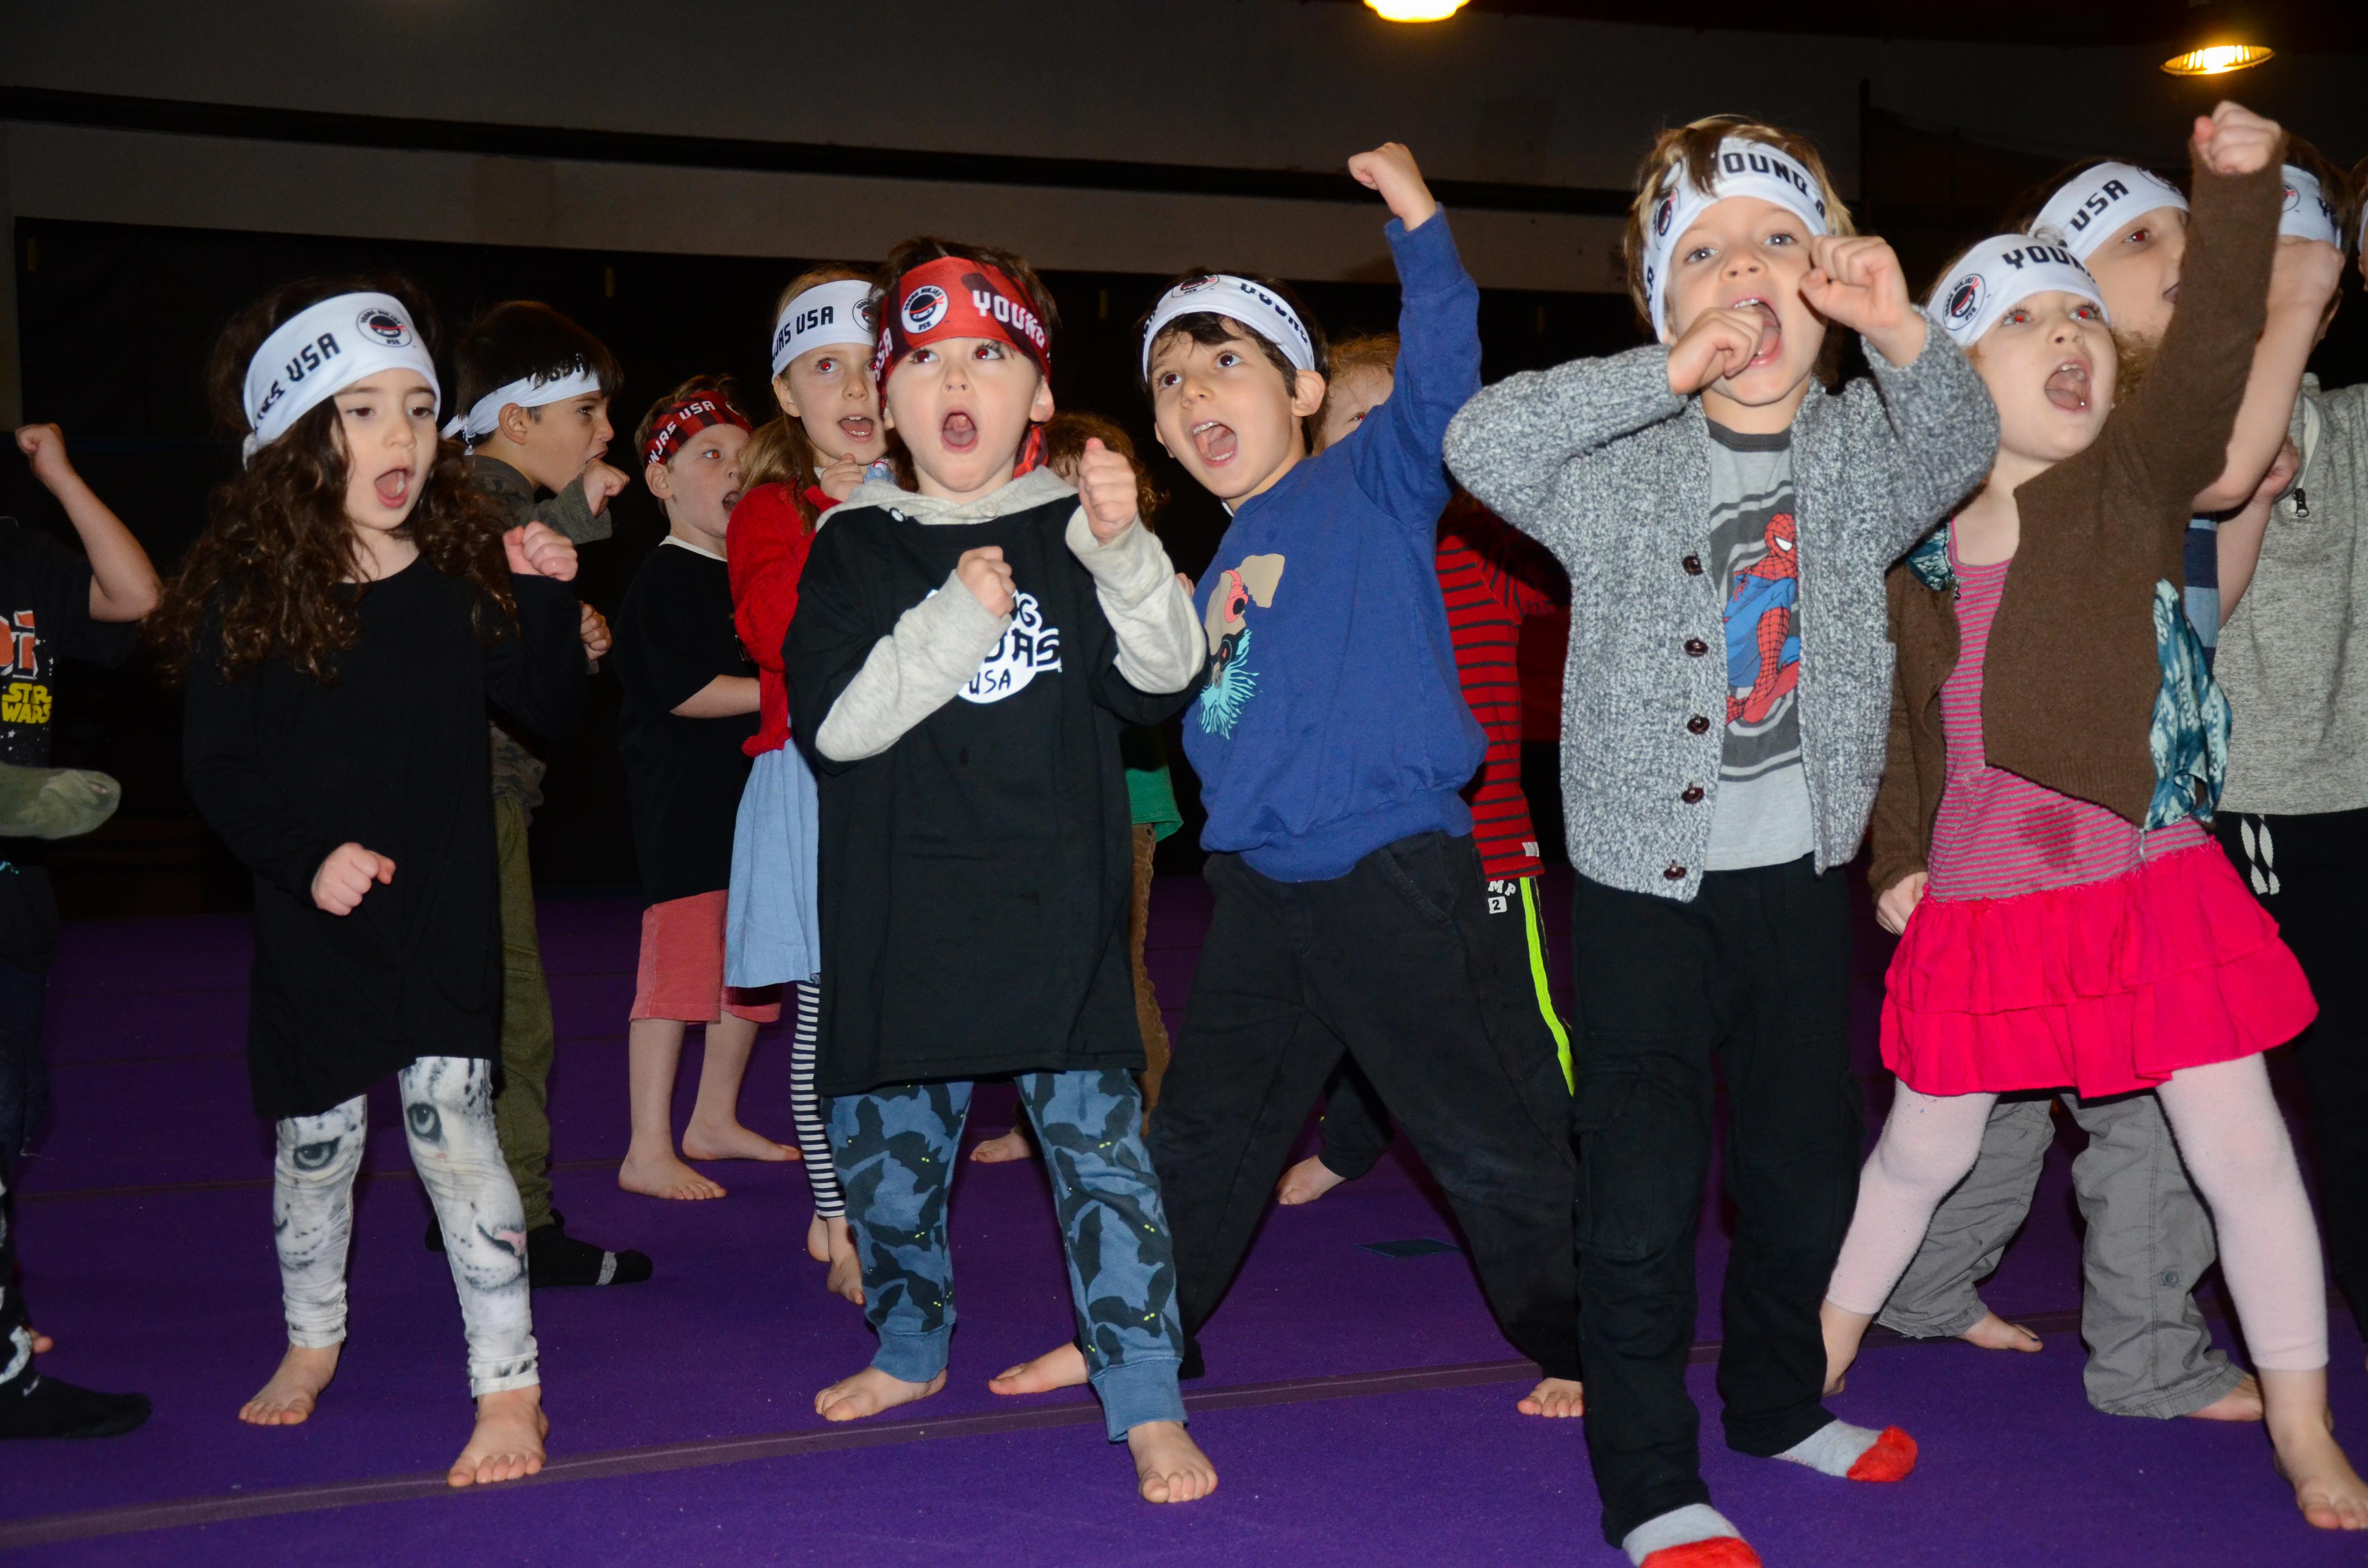 Young Ninjas USA - Martial Arts - 3637 Motor Ave, Palms